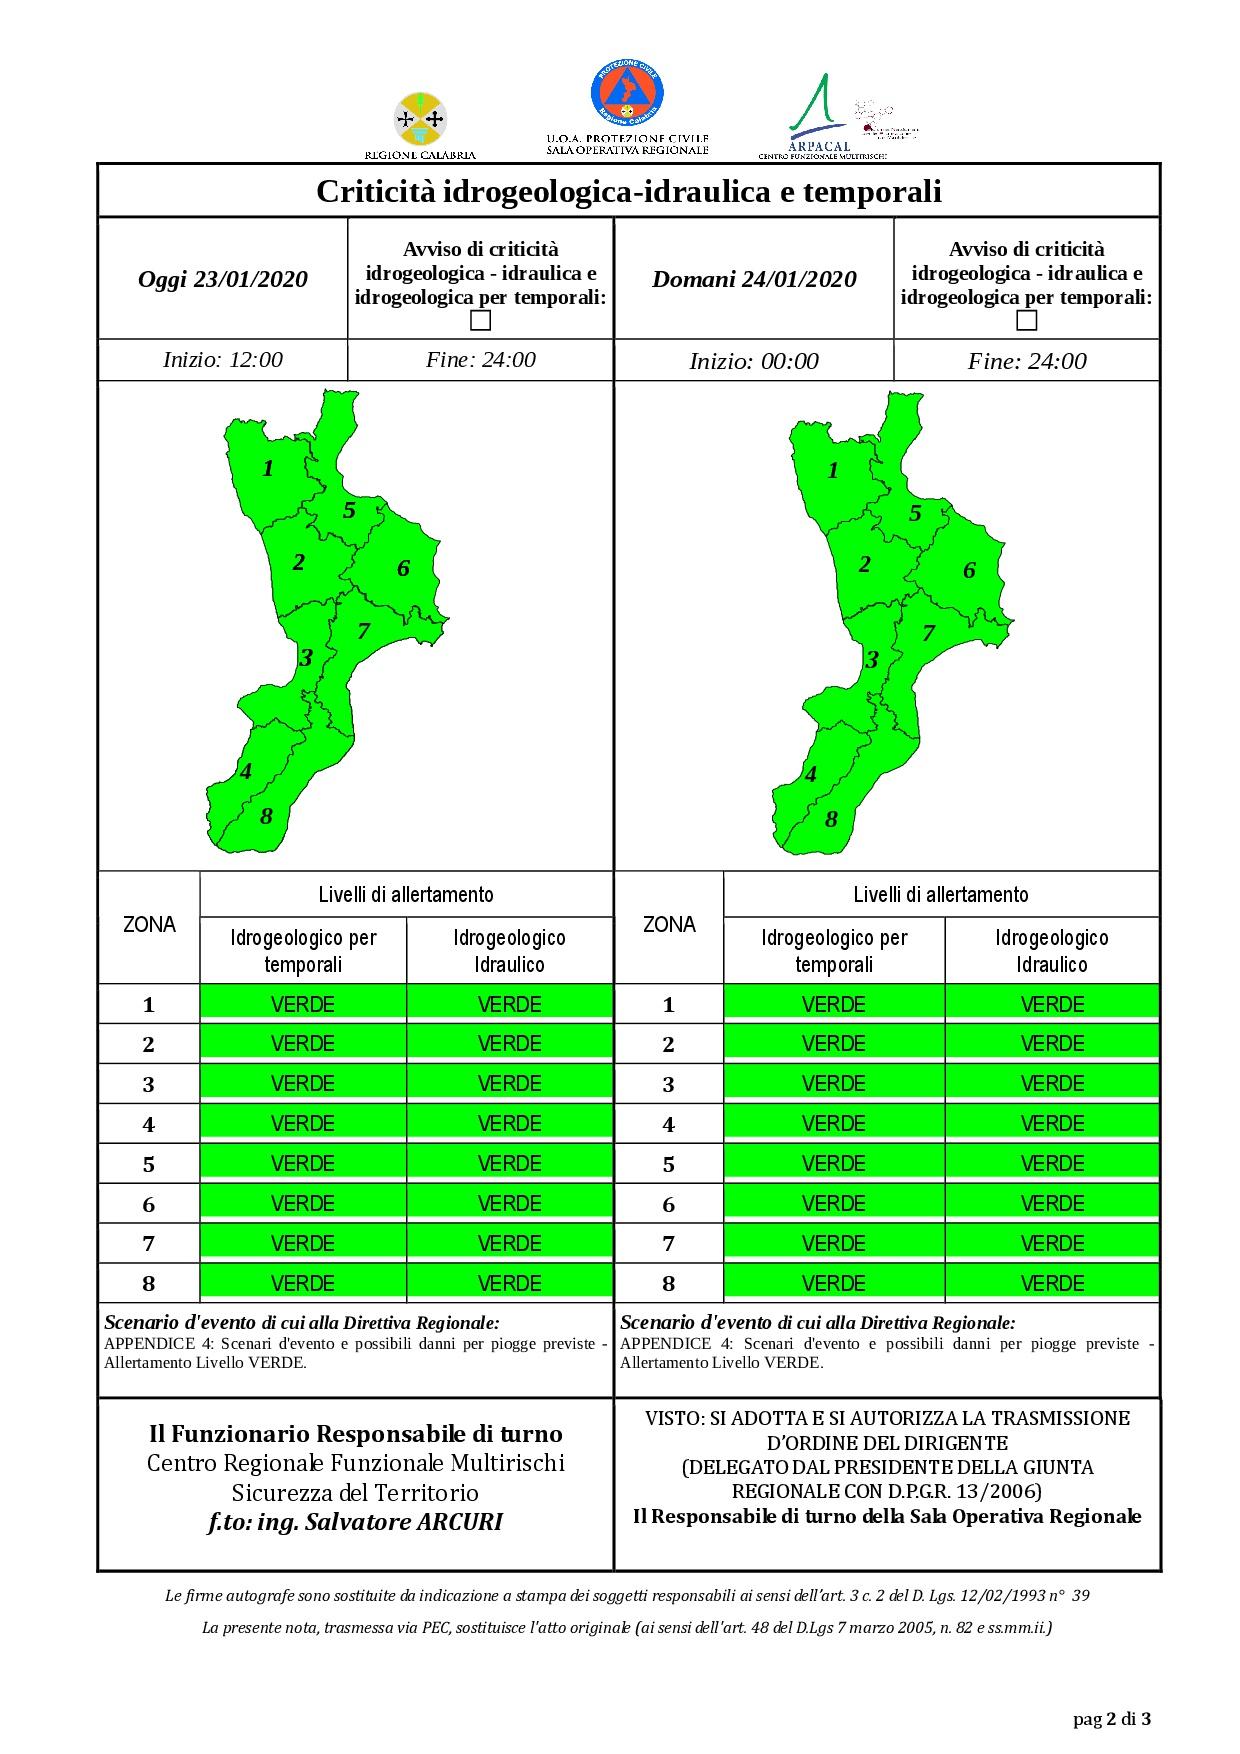 Criticità idrogeologica-idraulica e temporali in Calabria 23-01-2020